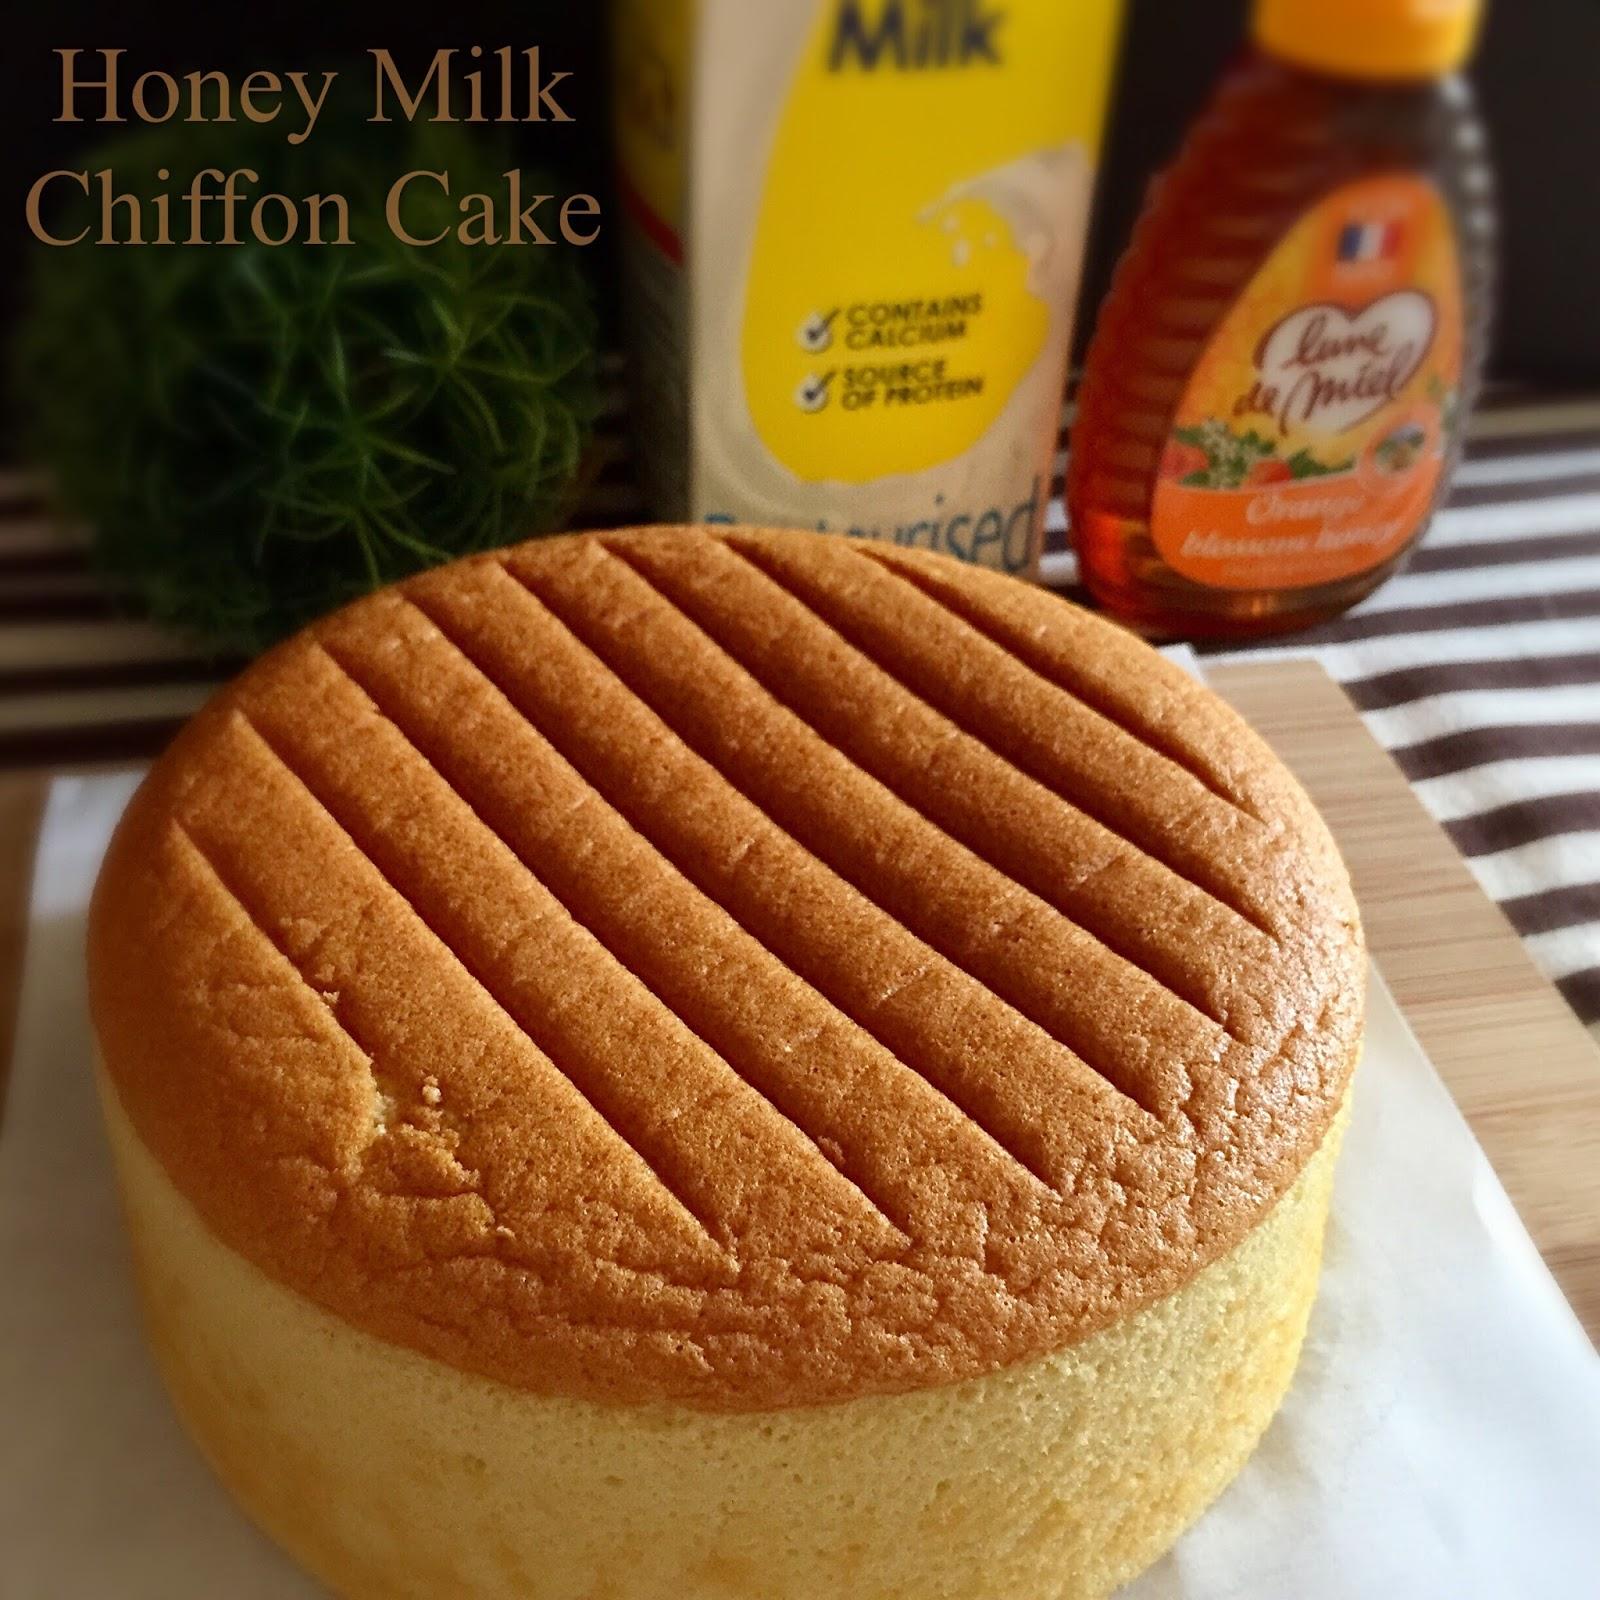 My Mind Patch Honey Milk Chiffon Cake 蜂蜜牛奶威风蛋糕